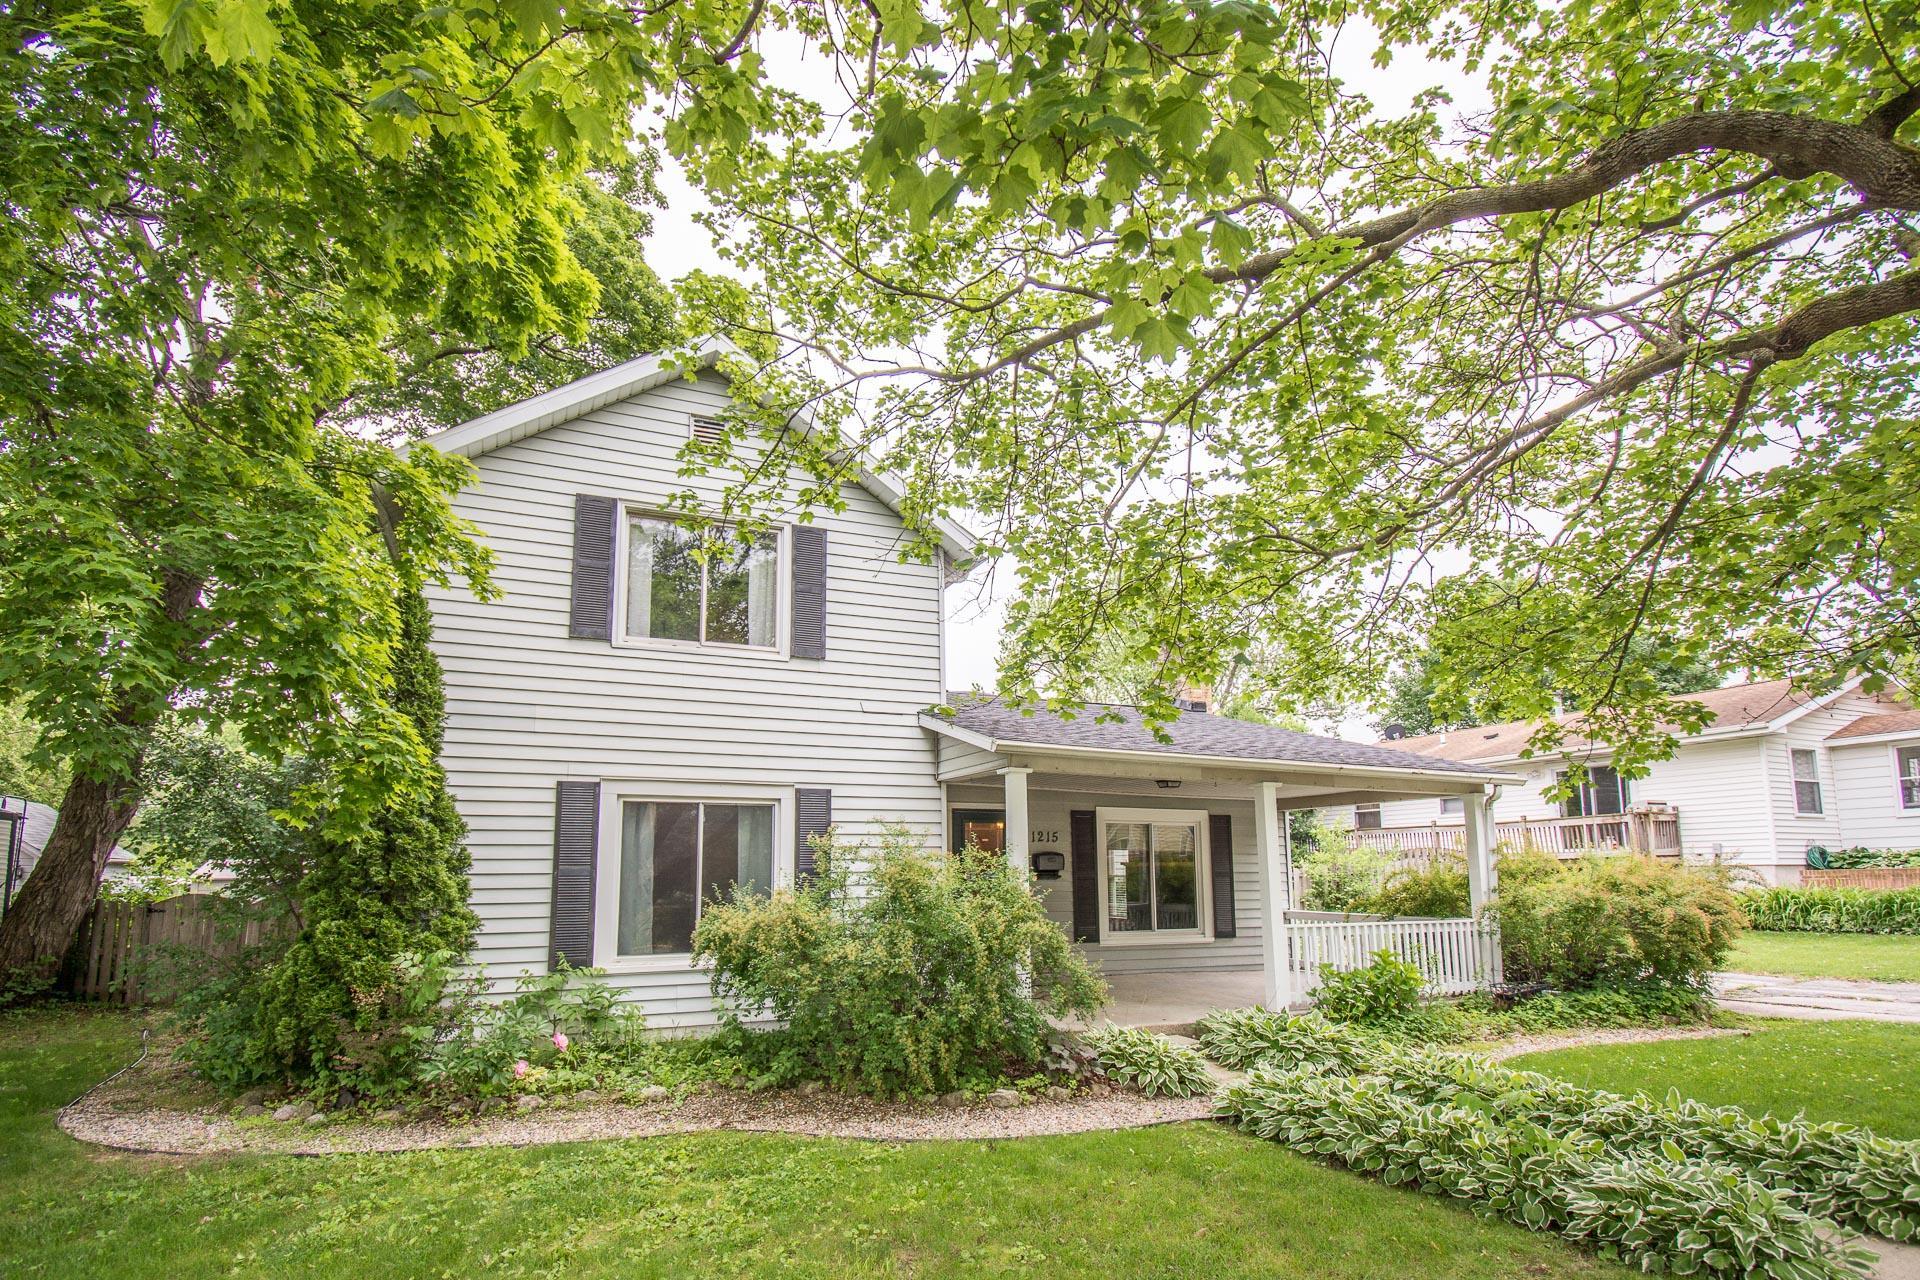 1215 Center St, Lake Geneva, Wisconsin 53147, 4 Bedrooms Bedrooms, ,1 BathroomBathrooms,Single-family,For Sale,Center St,1723198